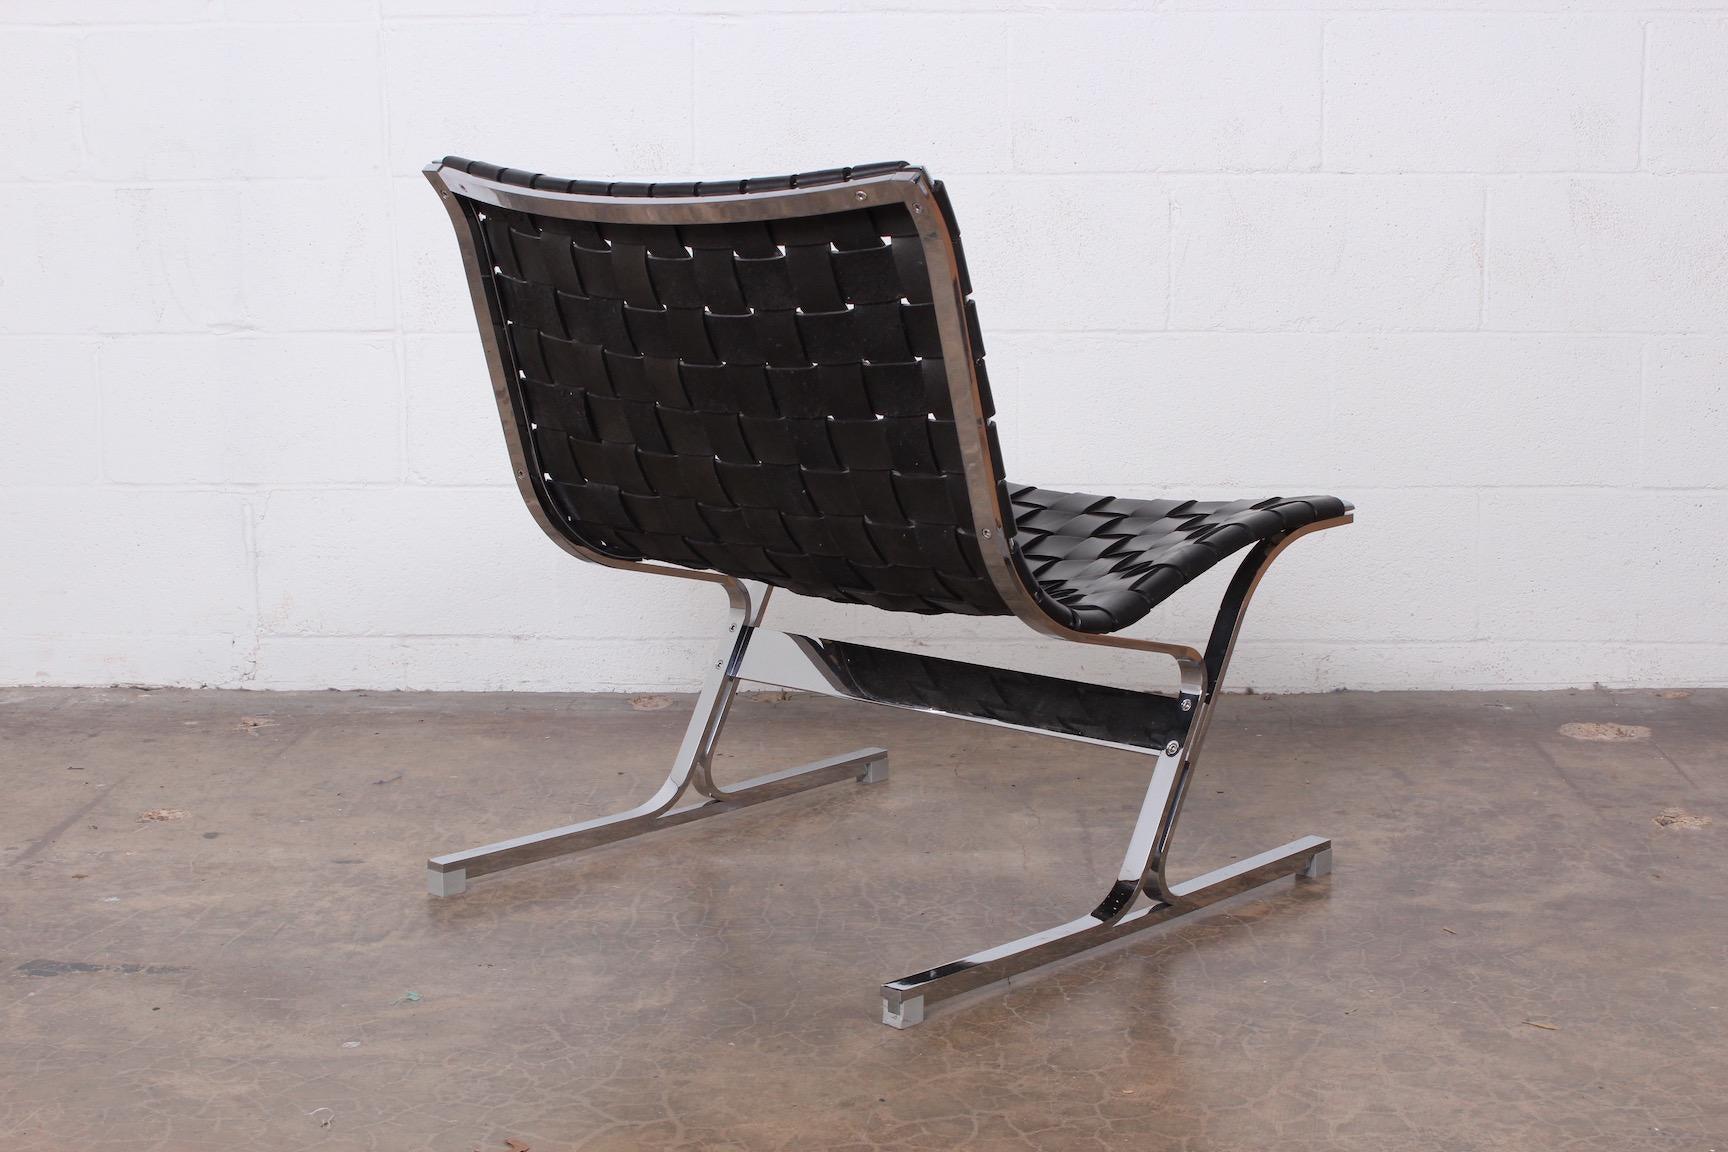 Incredible Luar Leather Lounge Chair By Ross Littell Creativecarmelina Interior Chair Design Creativecarmelinacom